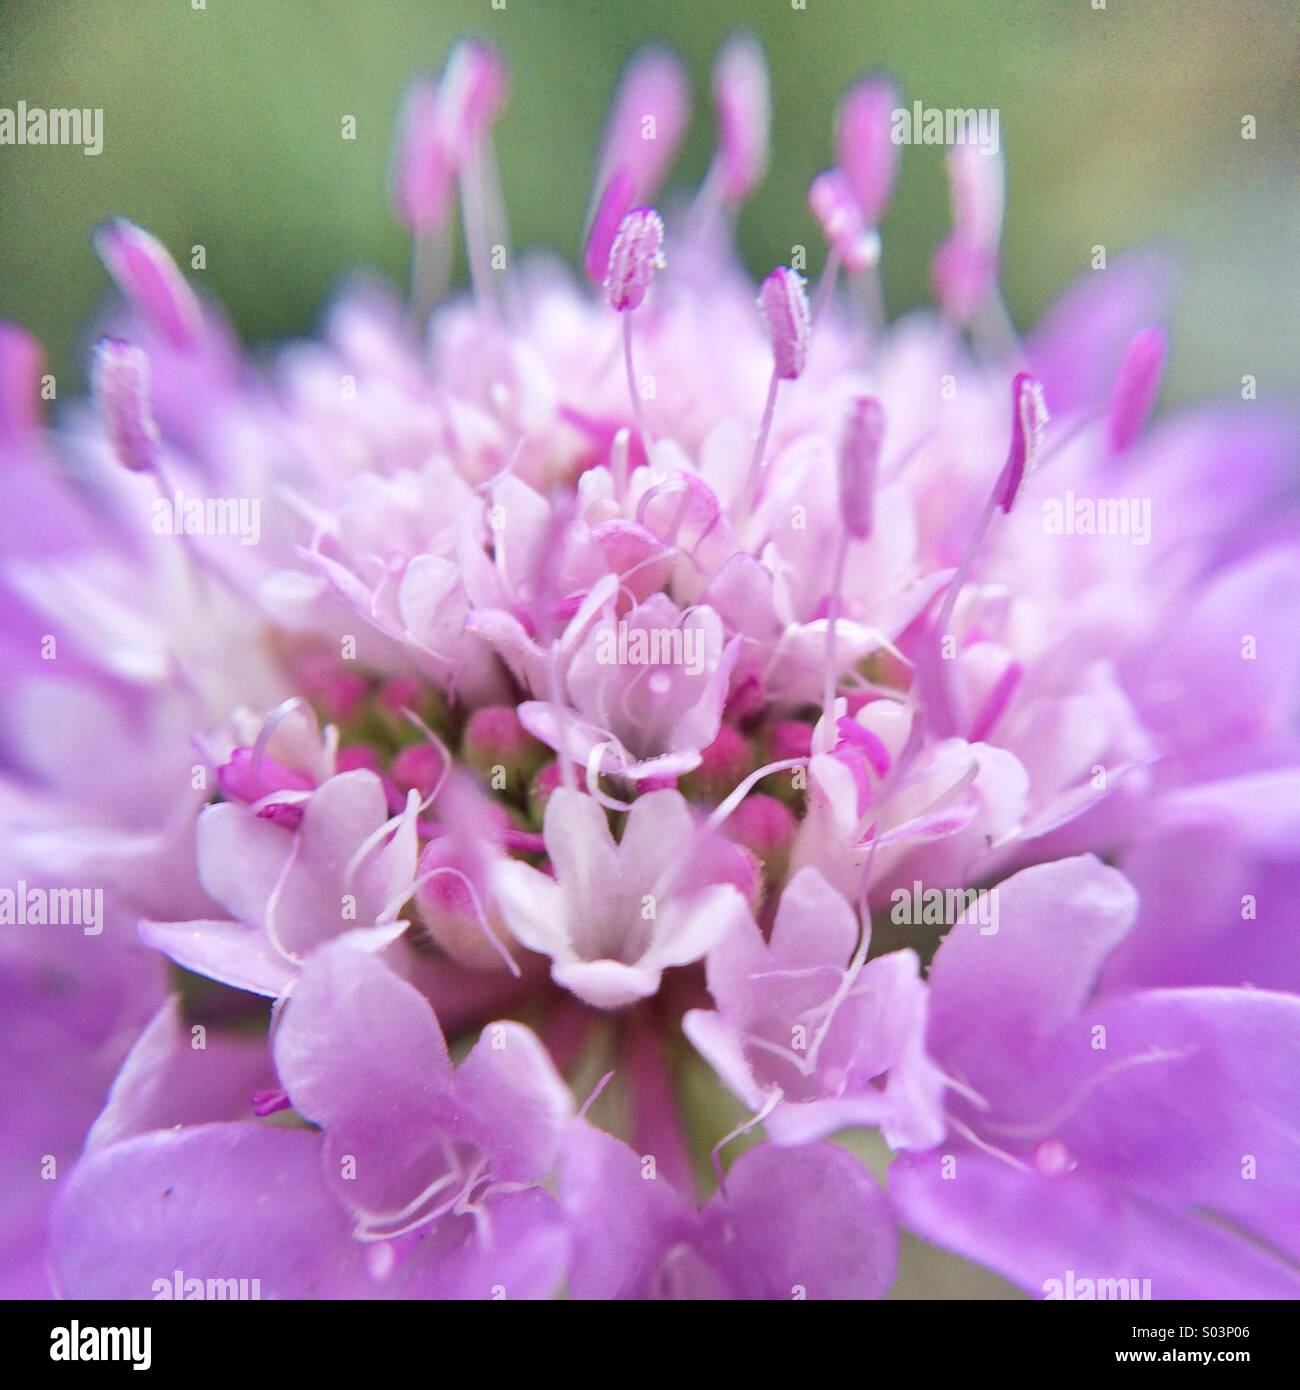 Macro of a pincushion flower - Stock Image